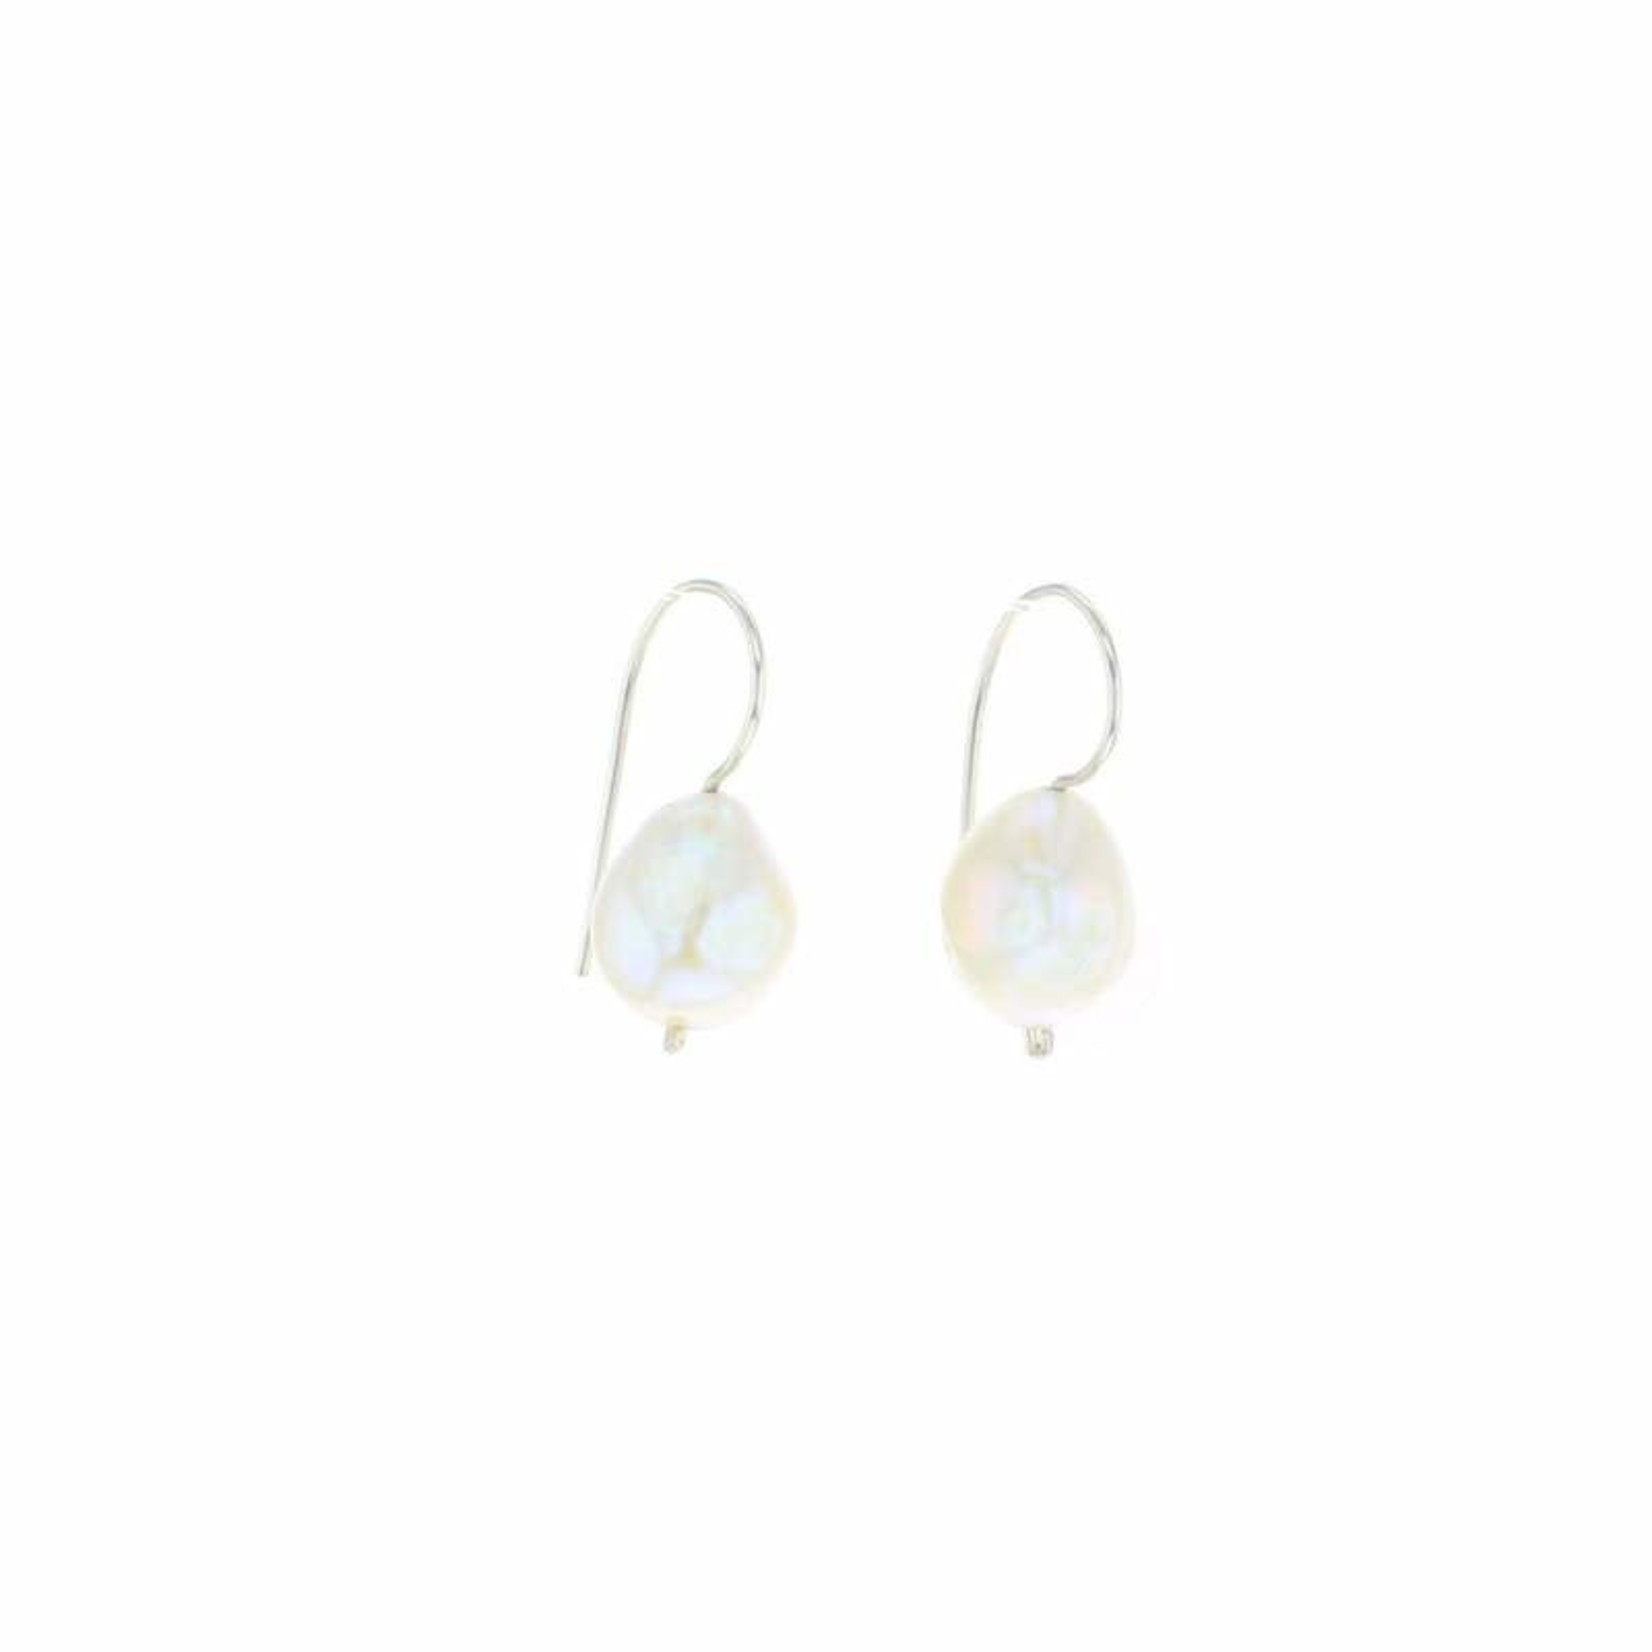 Lotus Jewelry Studio Bondi Earrings